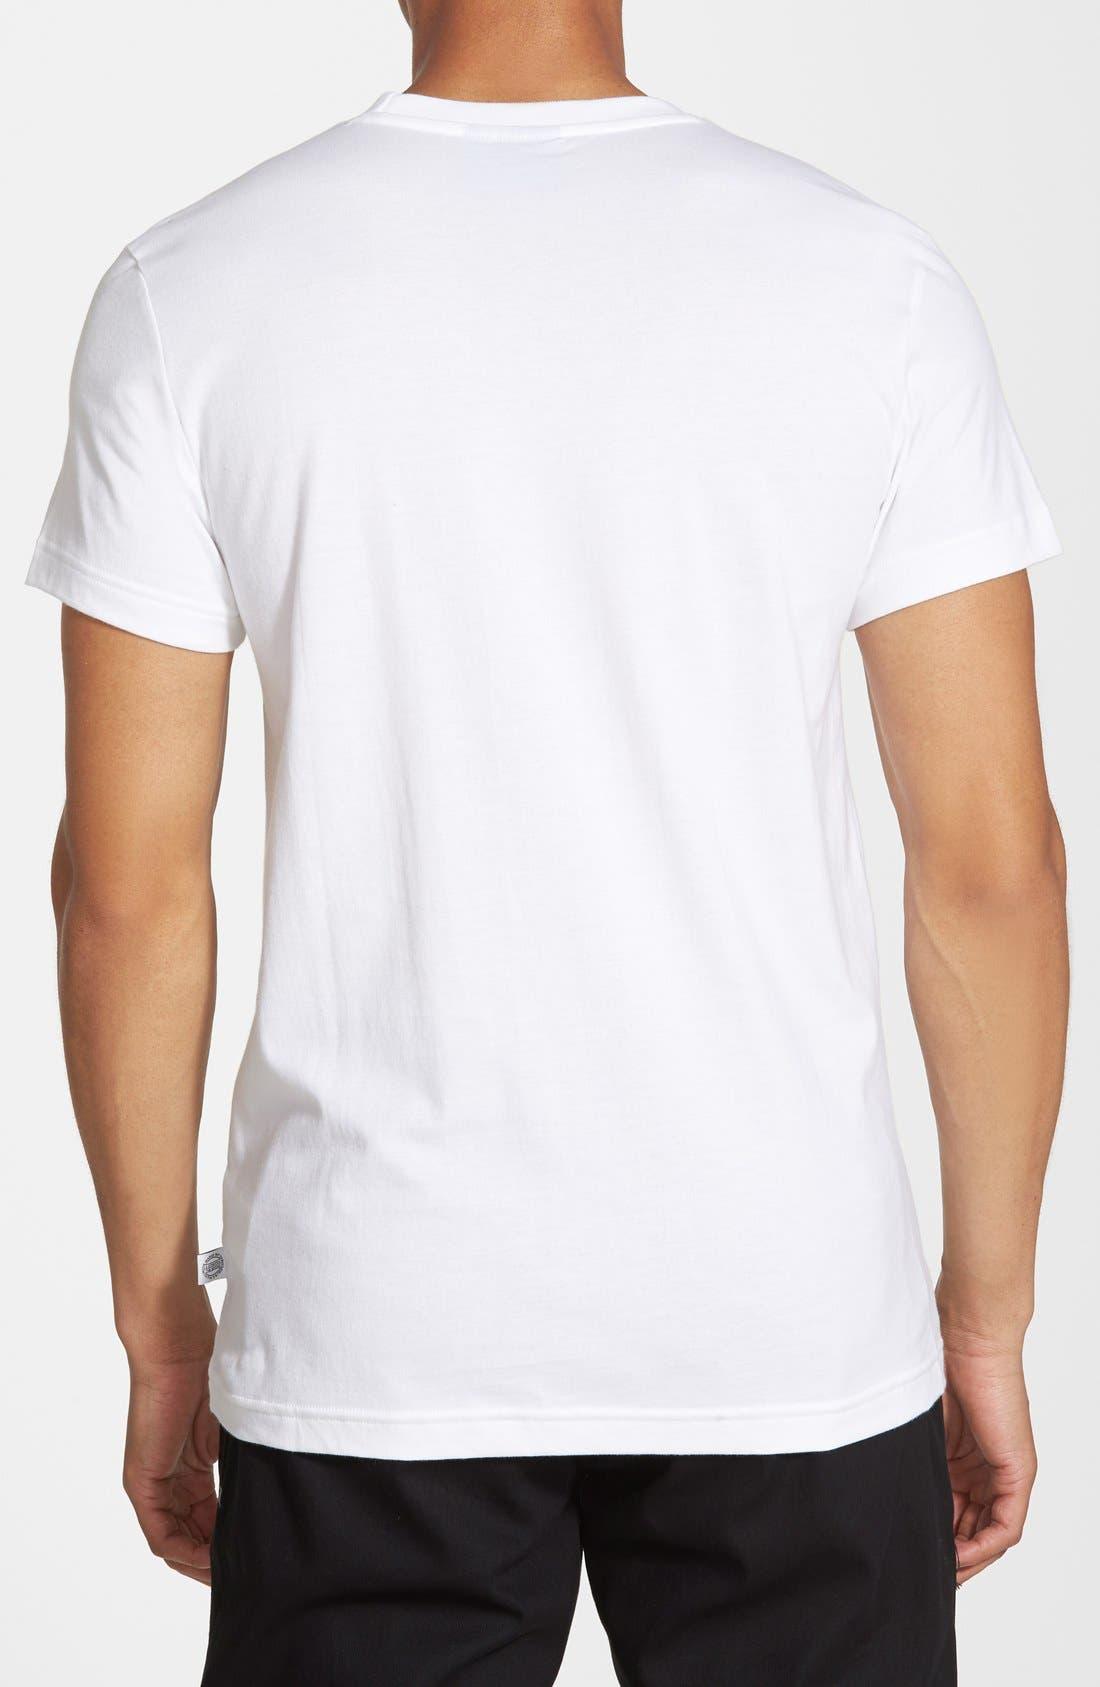 ADIDAS ORIGINALS, 'Island Superstar' Graphic T-Shirt, Alternate thumbnail 3, color, 100